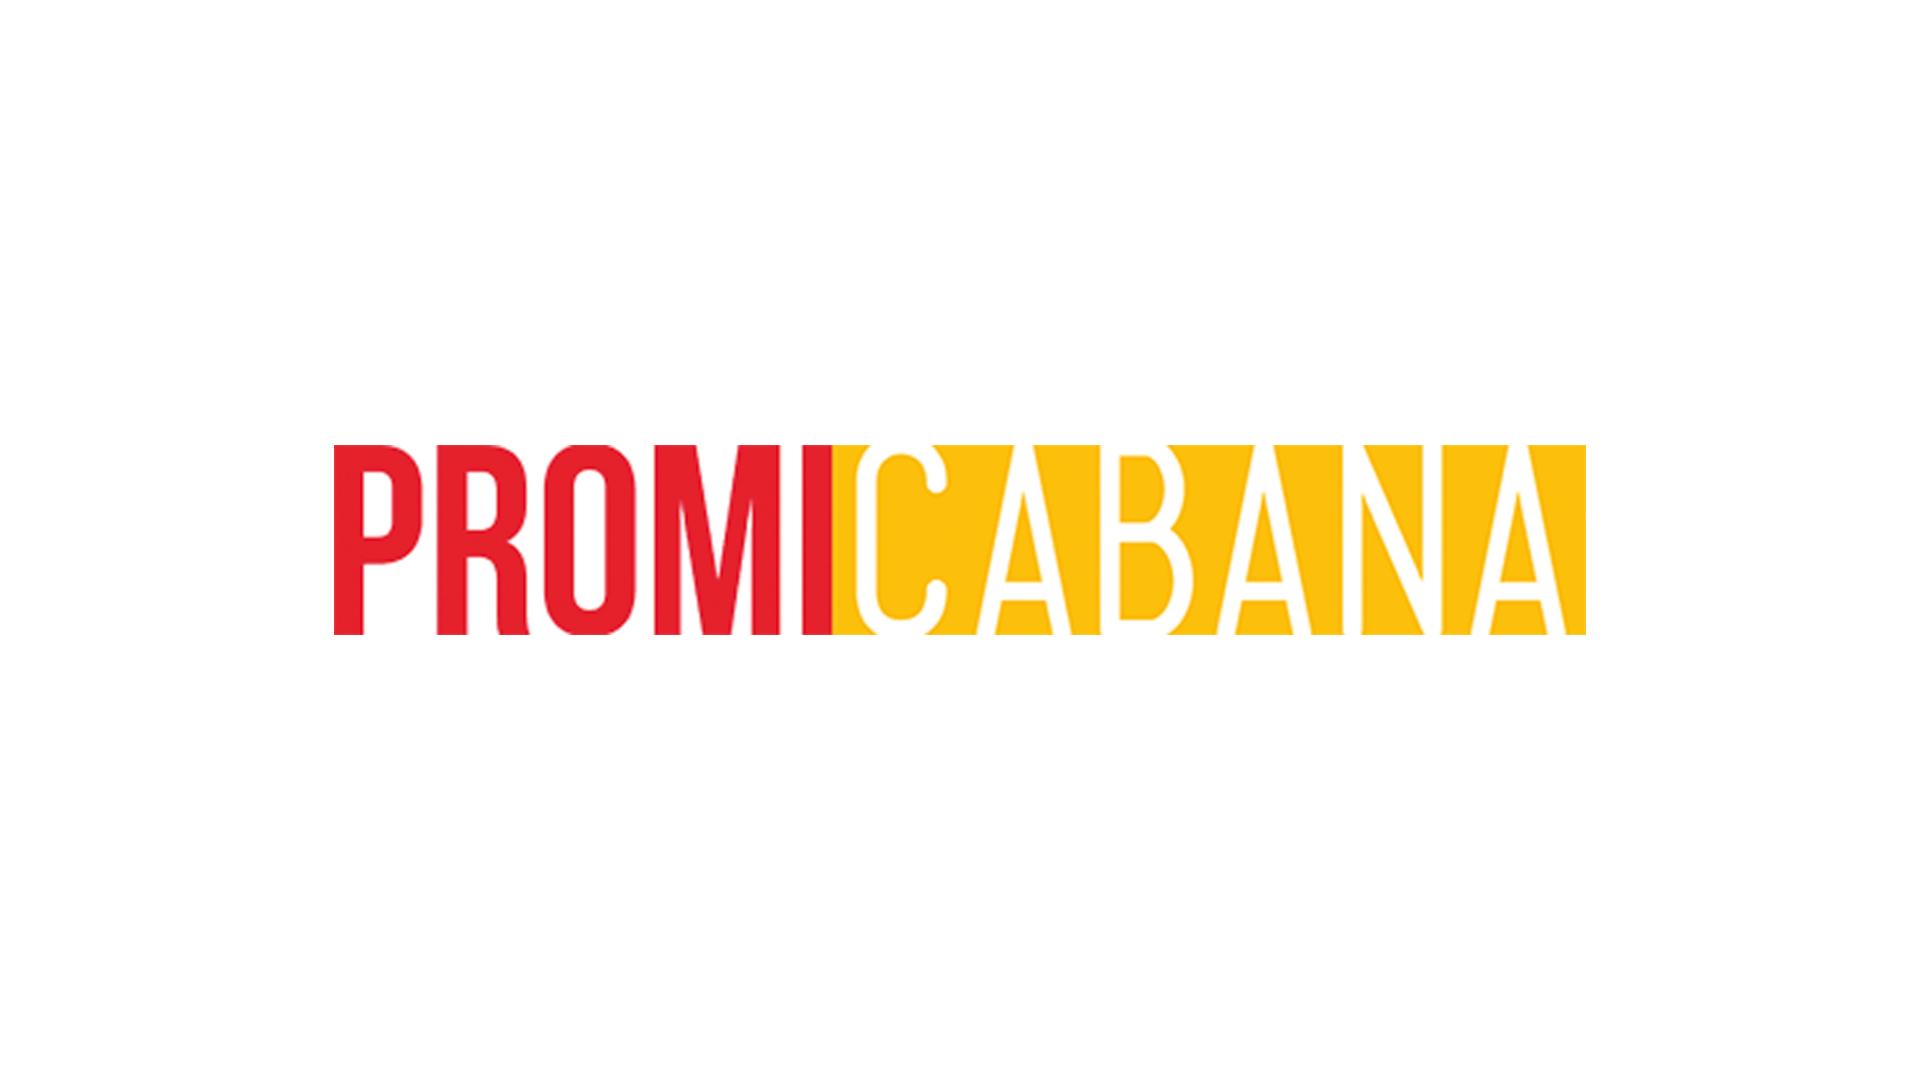 George-Clooney-Barack-Obama